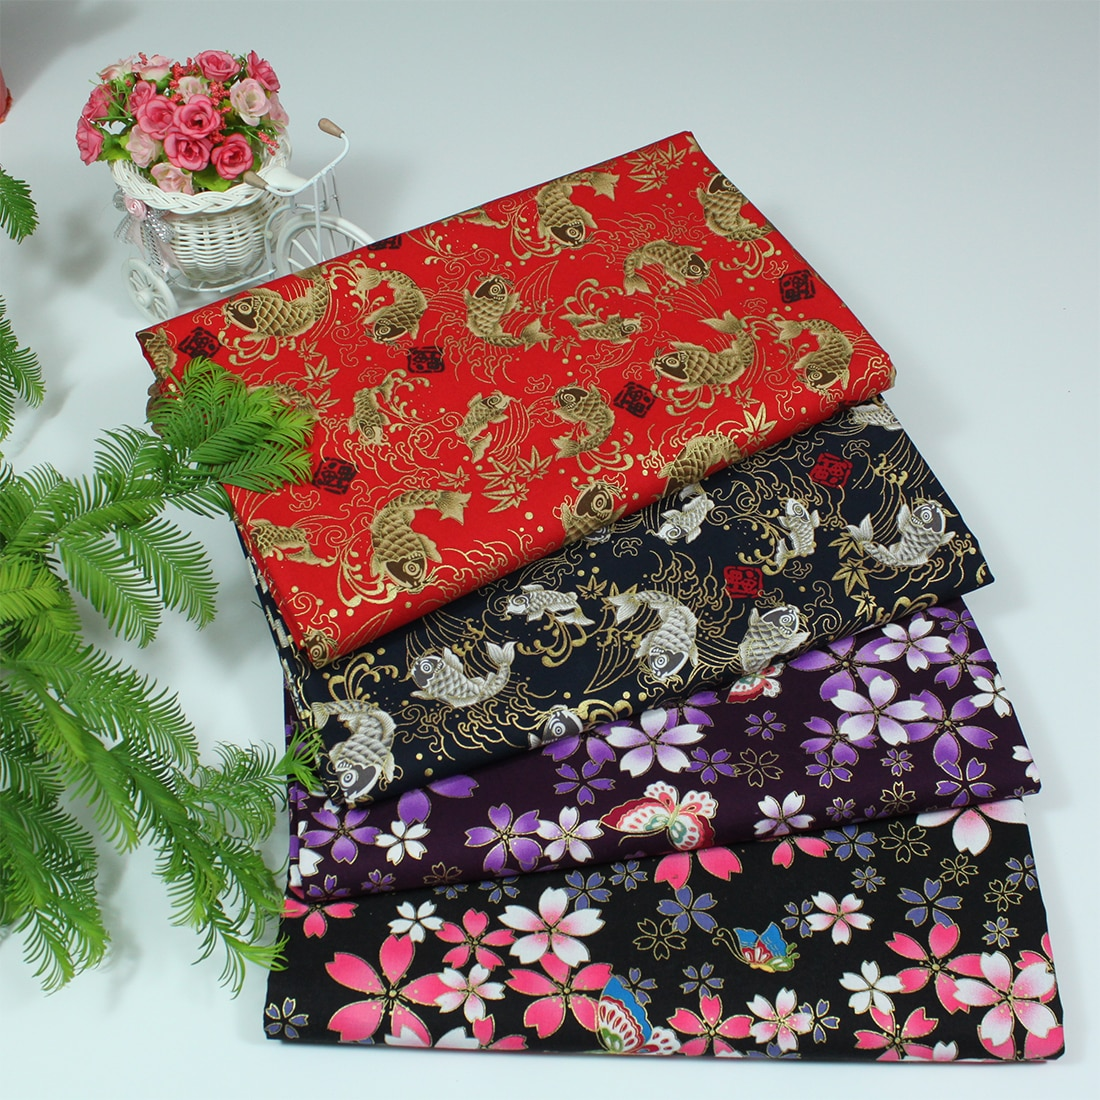 100% de algodón satinado, estilo japonés bronce, carpa, Sakura, telas de mariposa para mantel DIY, manualidades, colchas hechas a mano, decoración